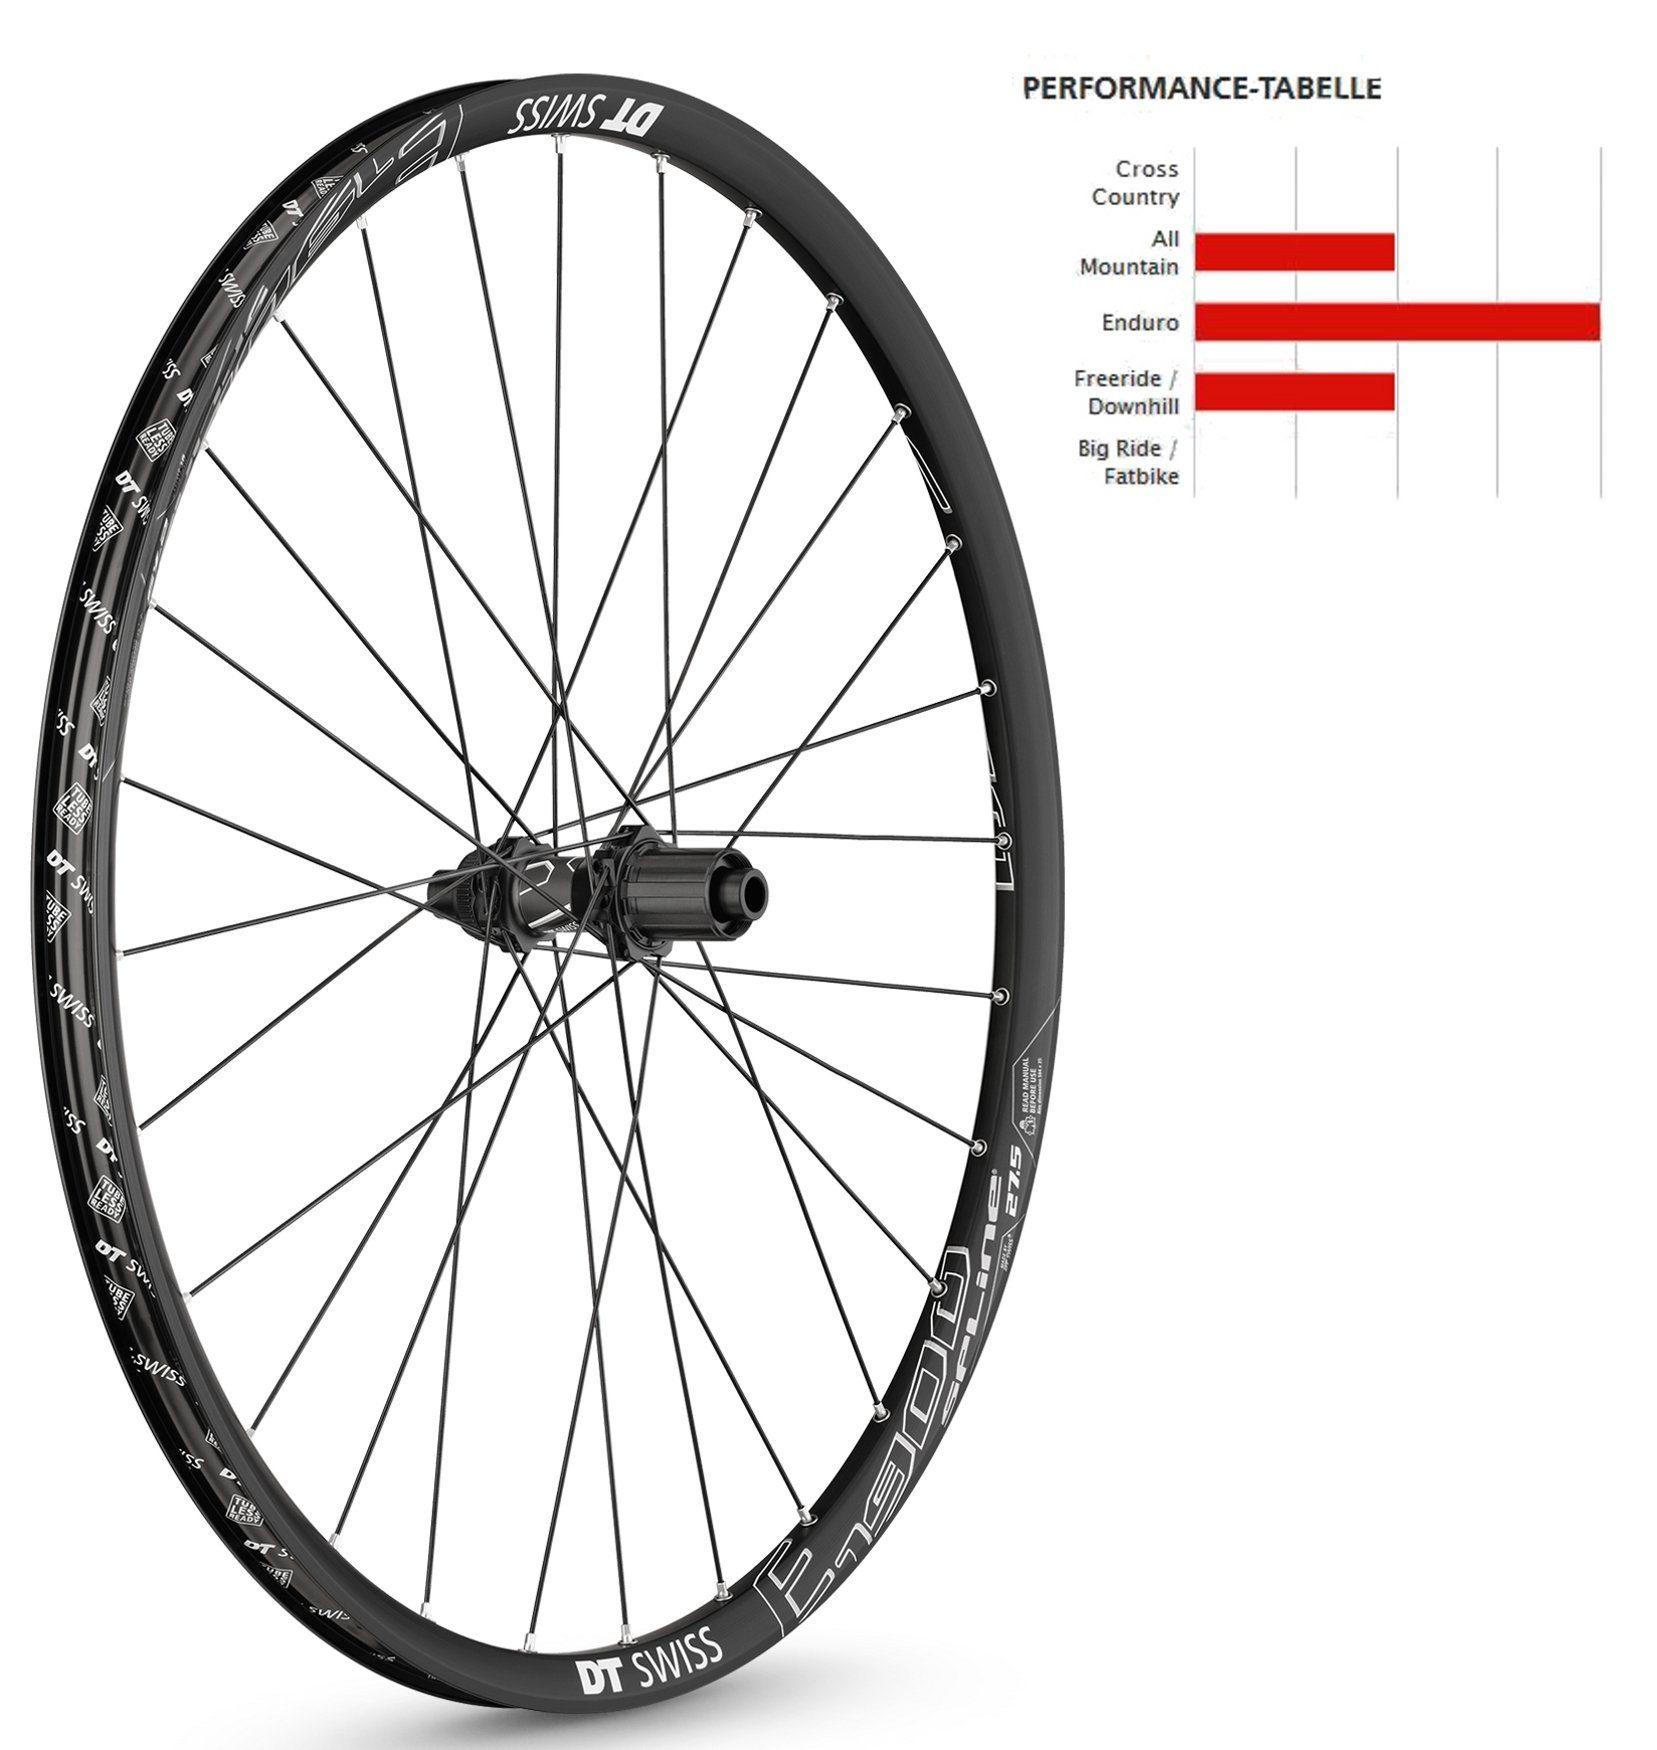 "DT Swiss Laufrad »E 1900 Spline Laufrad 27,5"" HR Alu 142/12mm Sram«"